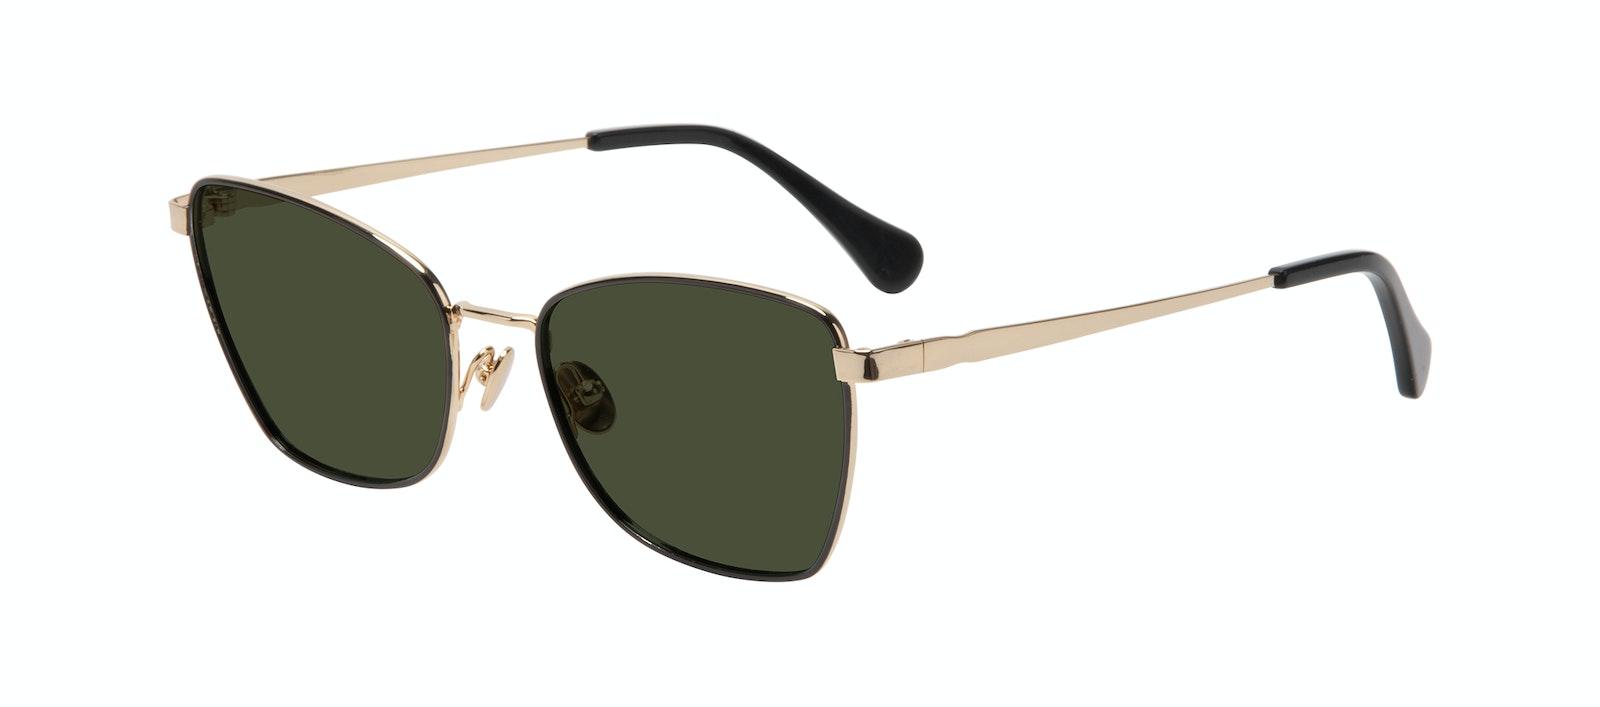 Affordable Fashion Glasses Cat Eye Sunglasses Women Fancy Deep Gold Tilt